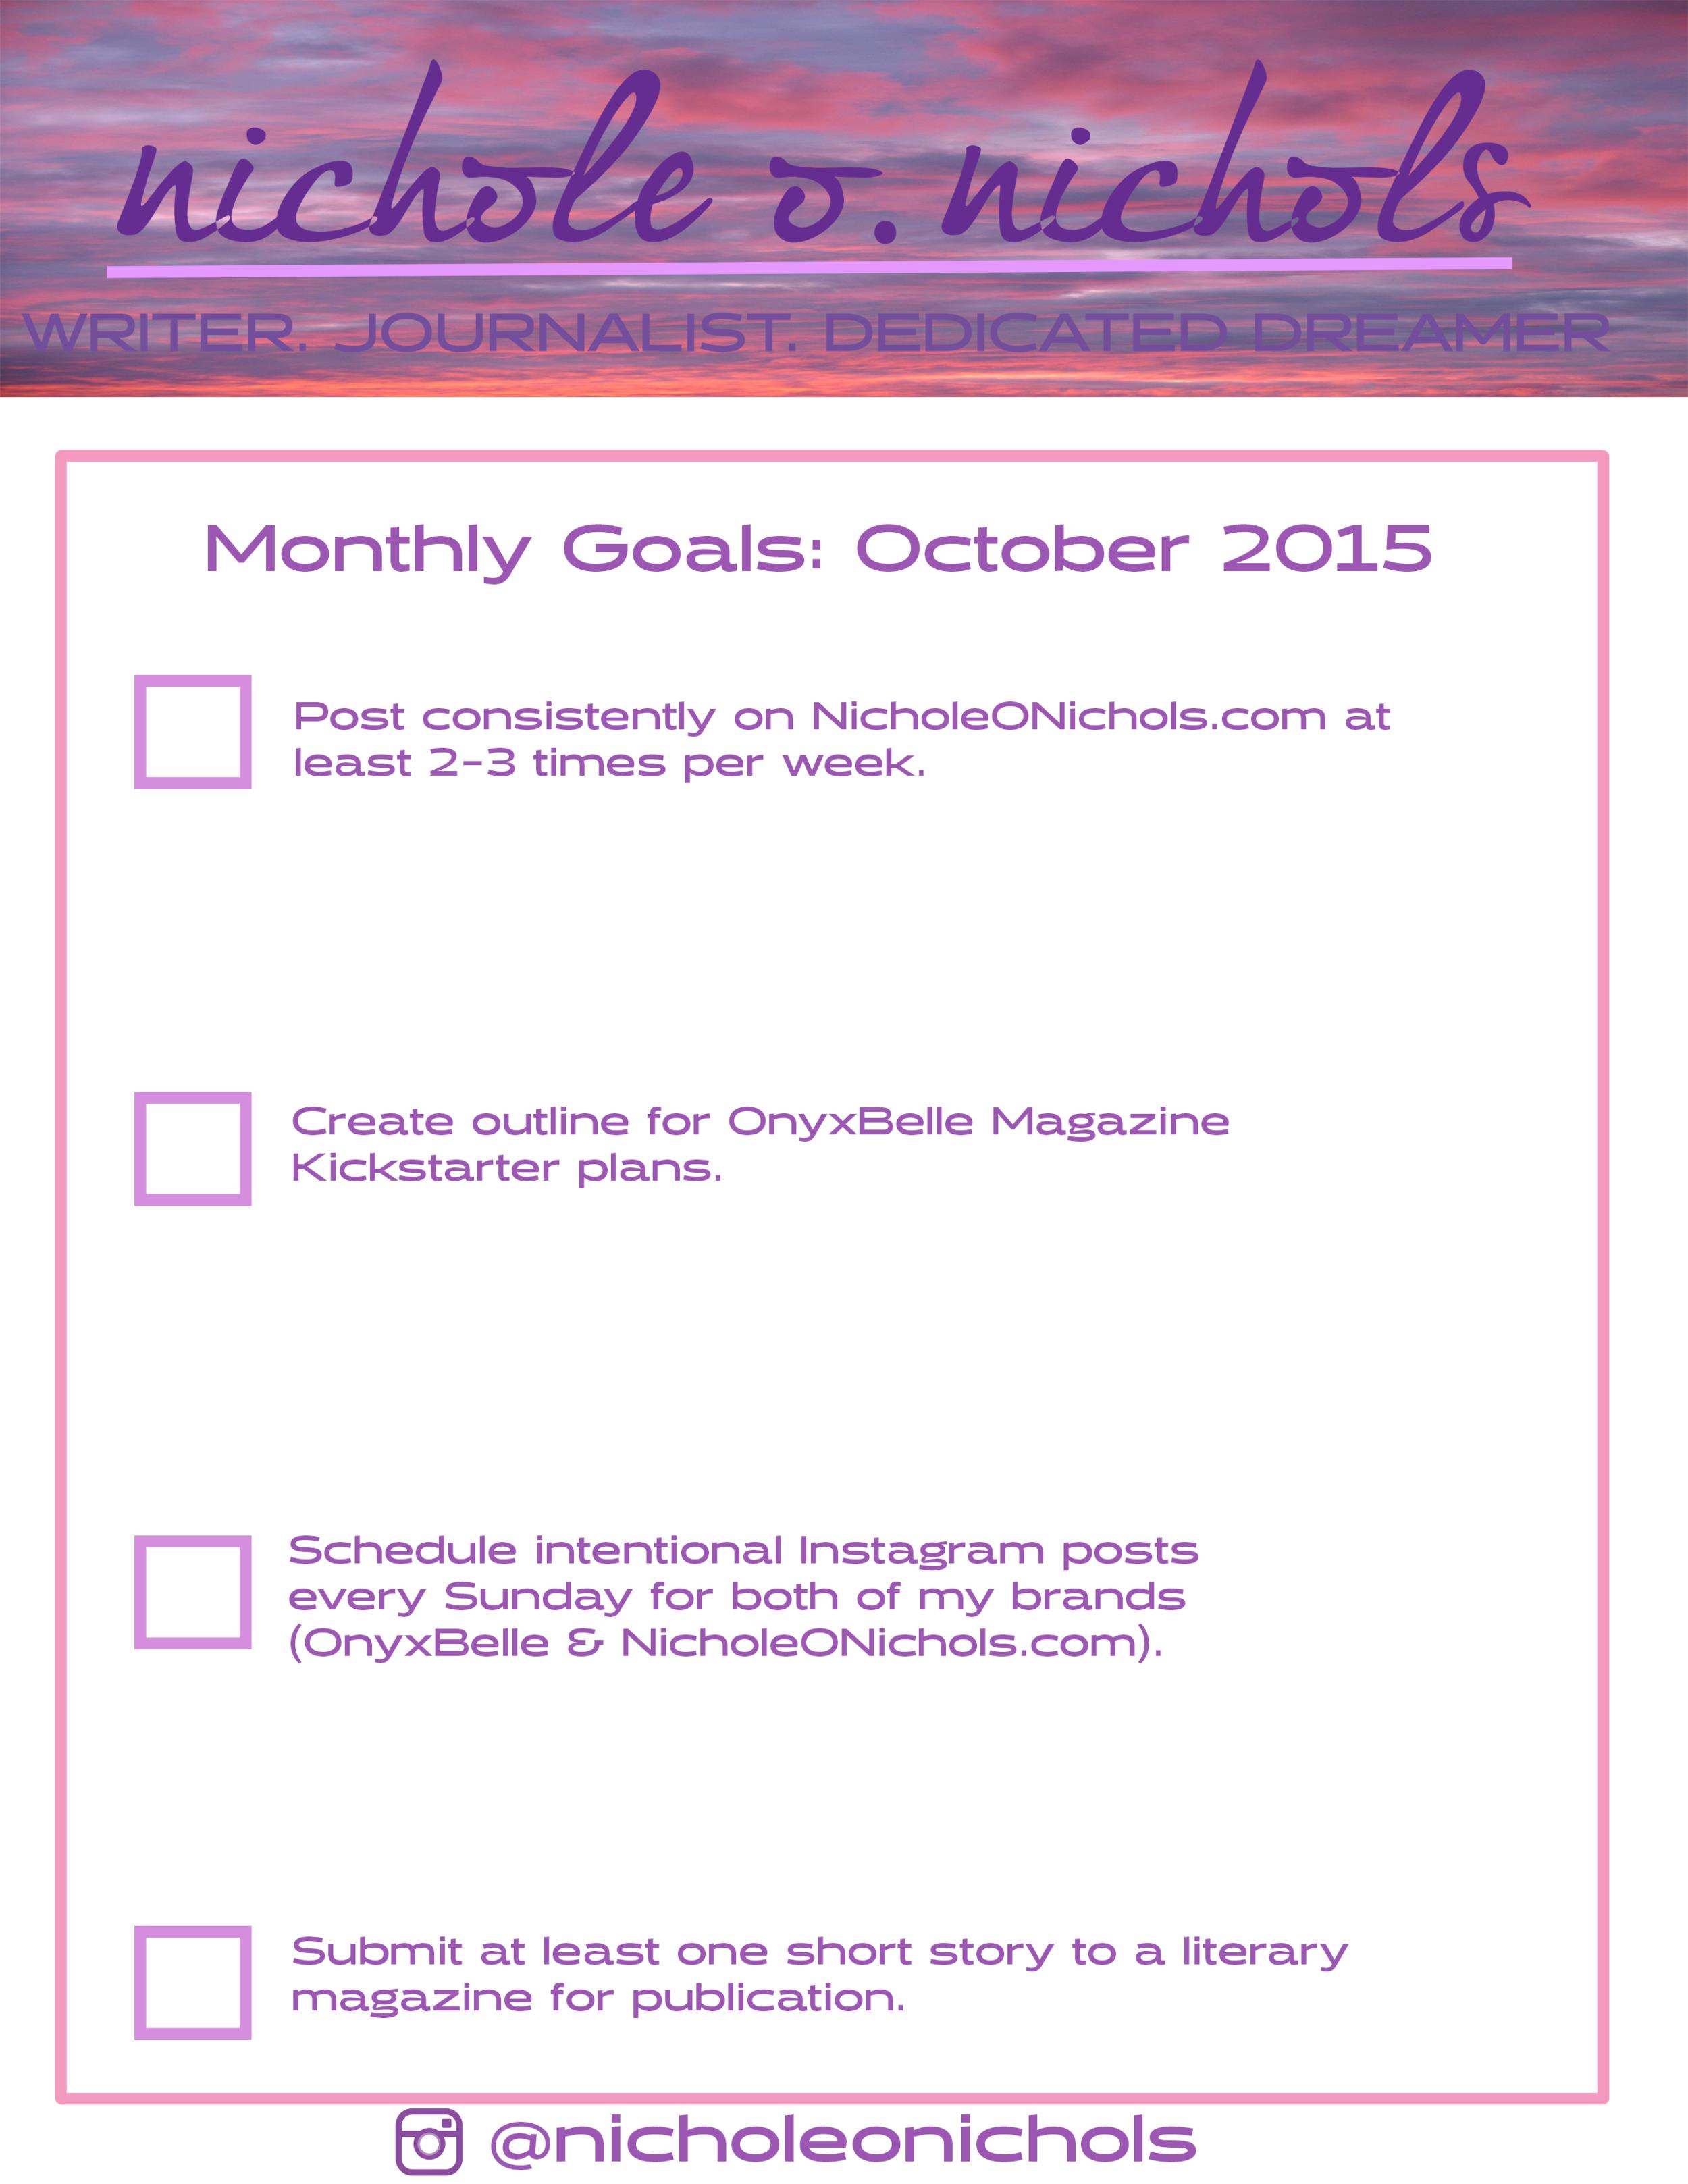 NicholeONicholsGoals_Oct2015